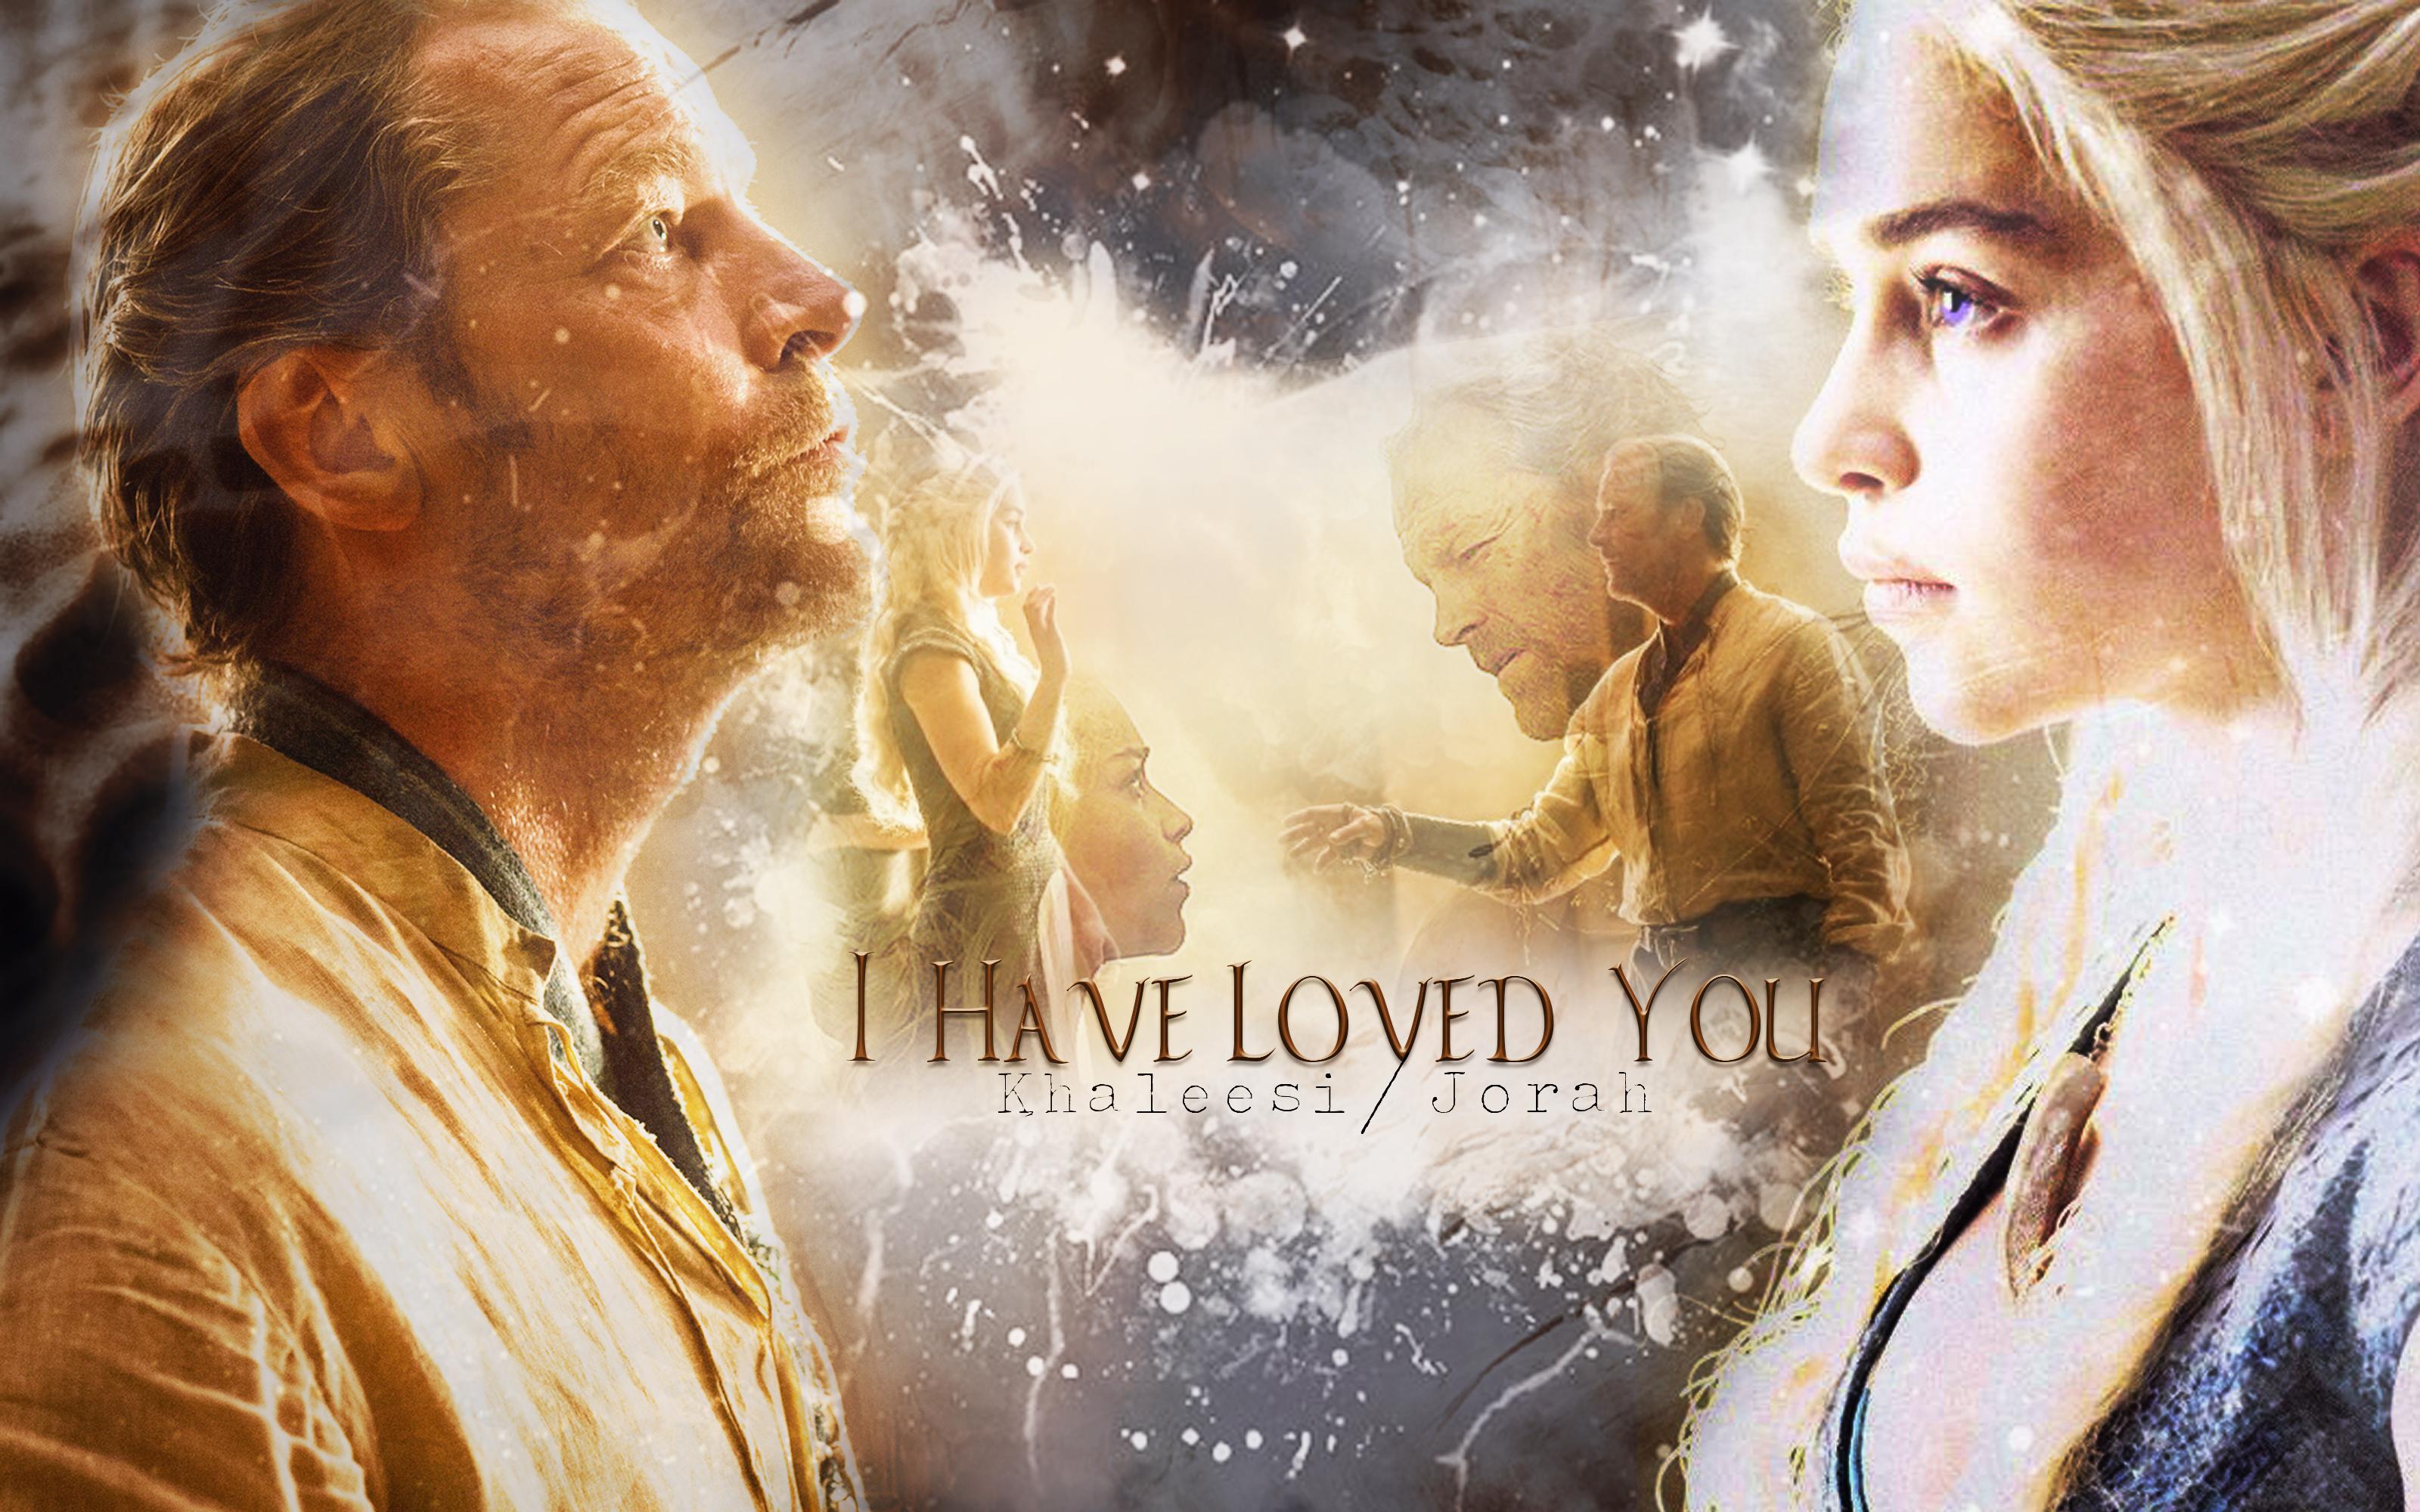 Jorah Mormont & Daenerys Targaryen